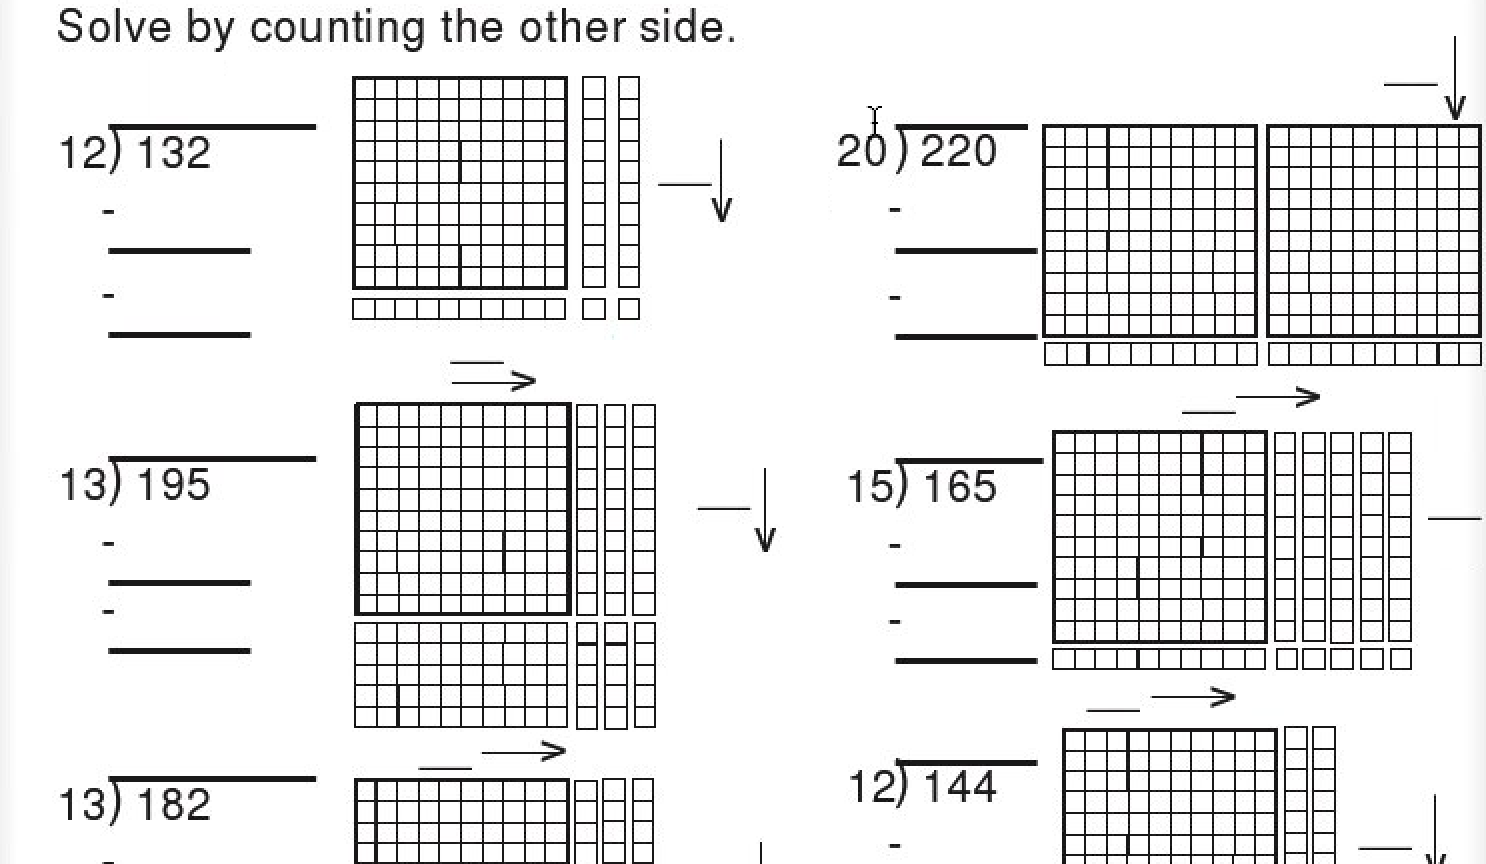 medium resolution of Crewton Ramone's Blog of Math: Base Ten Block Division Worksheets